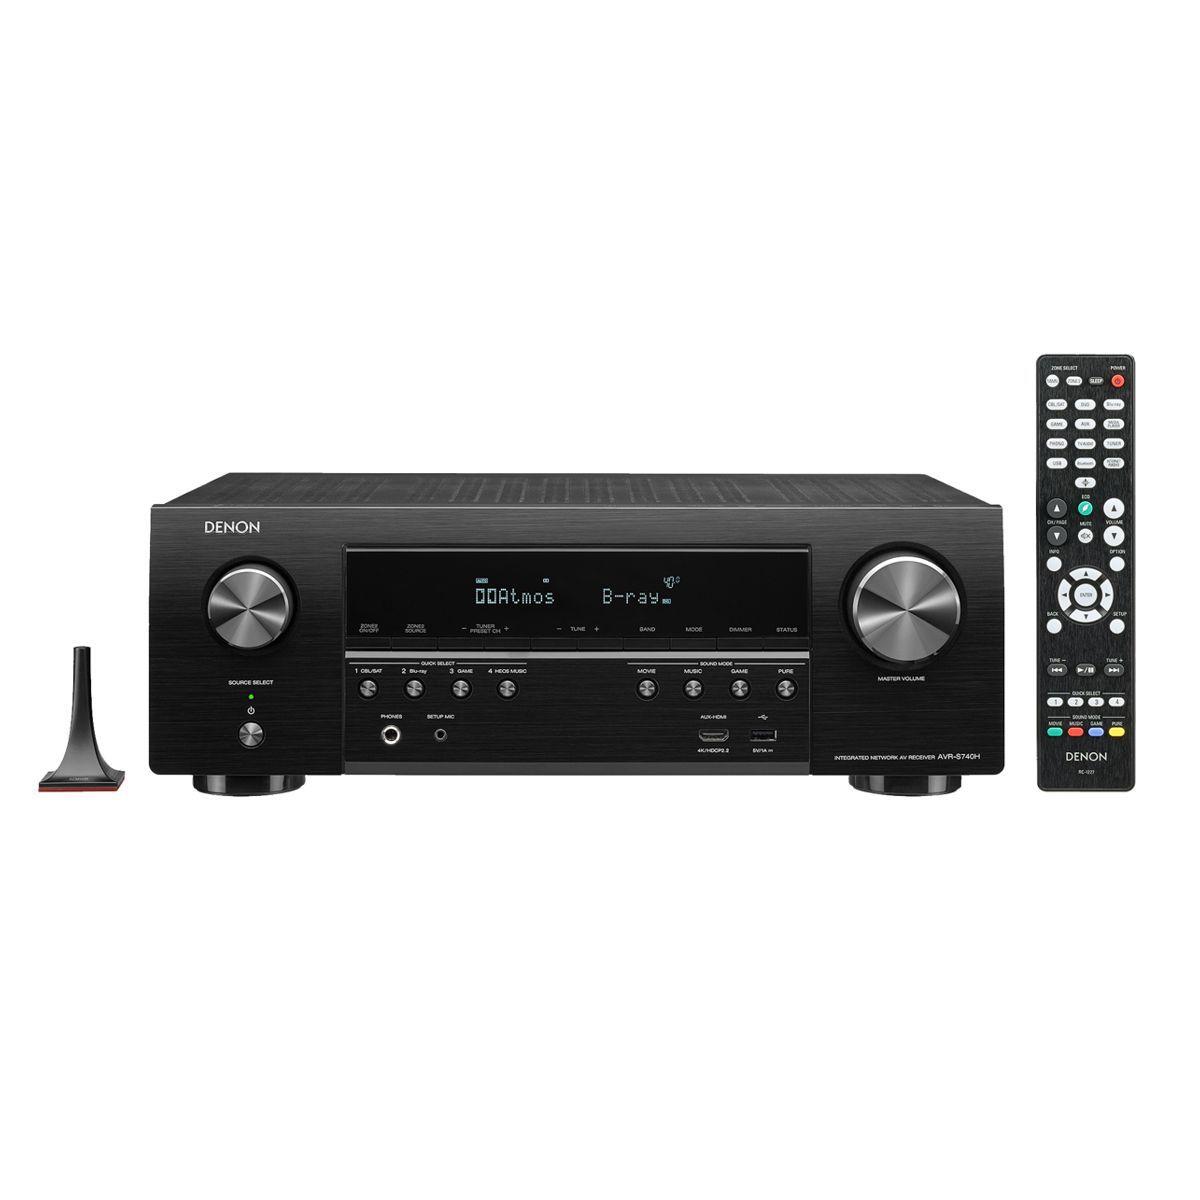 Receiver Digital 7.2 Dolby Atmos 4K UHD HDR Bluetooth USB Wi-FI AVR-S740H Denon